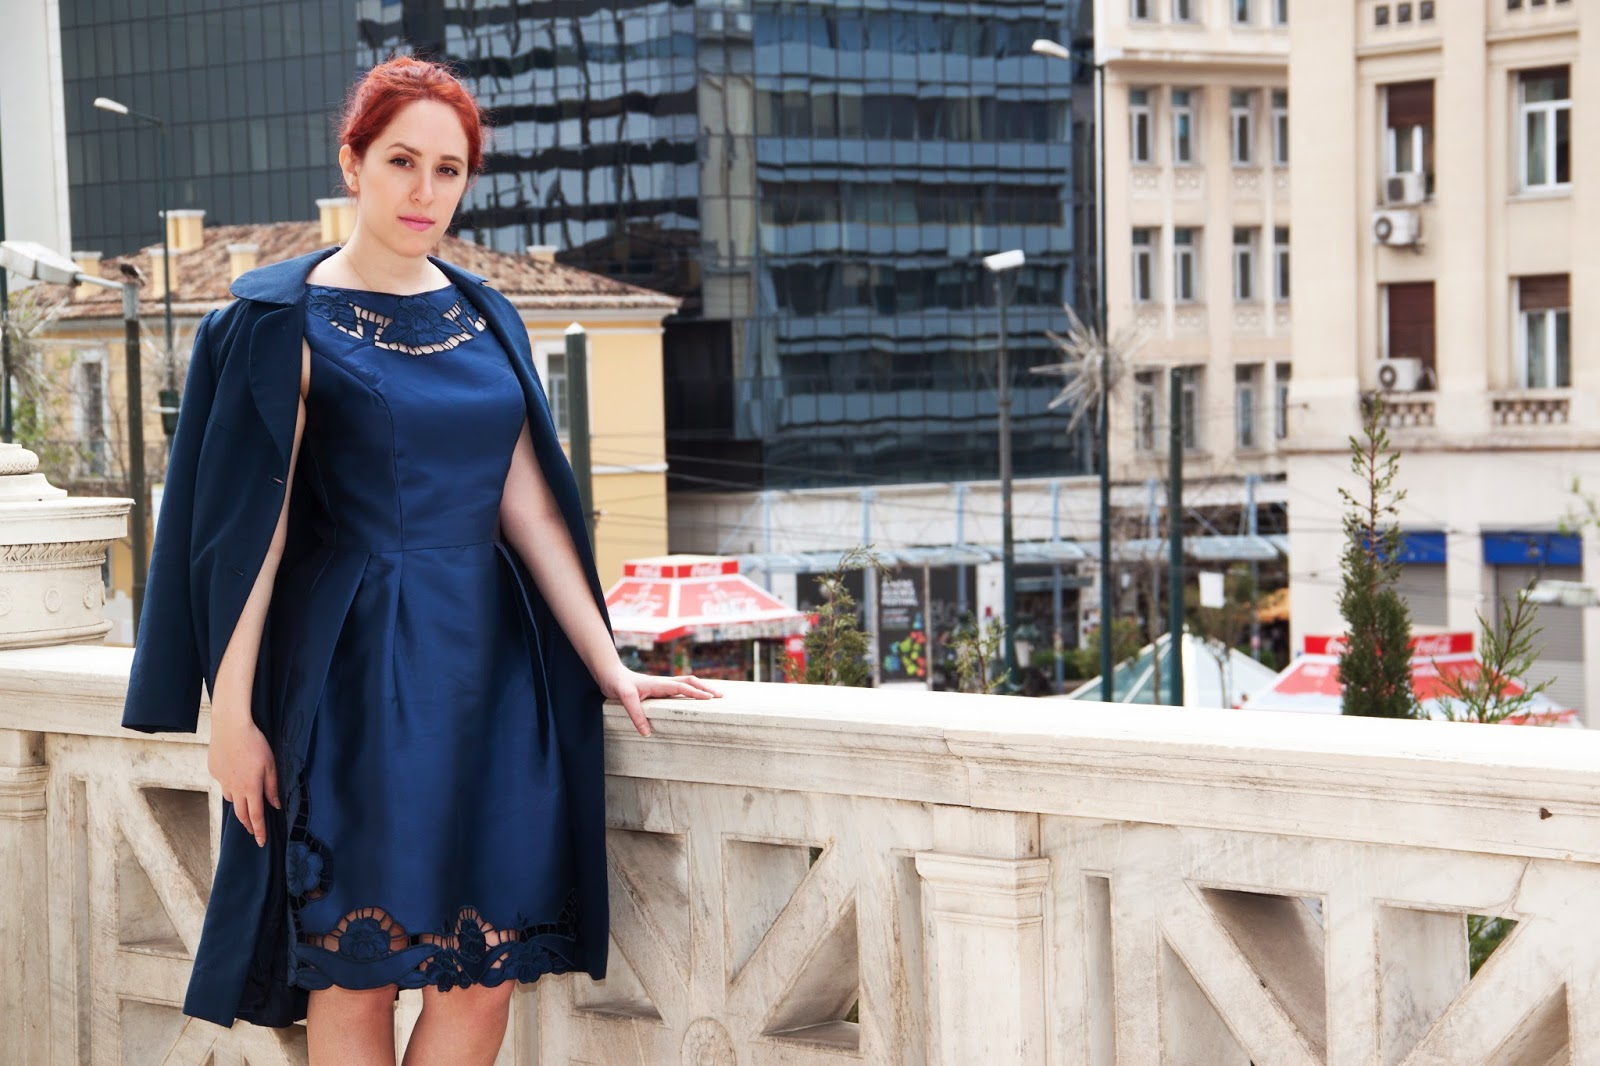 Redhead, spotlights on the redhead, clothes, Anna Keni, Anna, fashion, blogger, fashion blogger, review, dress, model, hot,royals, photoshoot, mini, chichi,chichiClothing, Sun Goes Down,Robin Schulz, blue